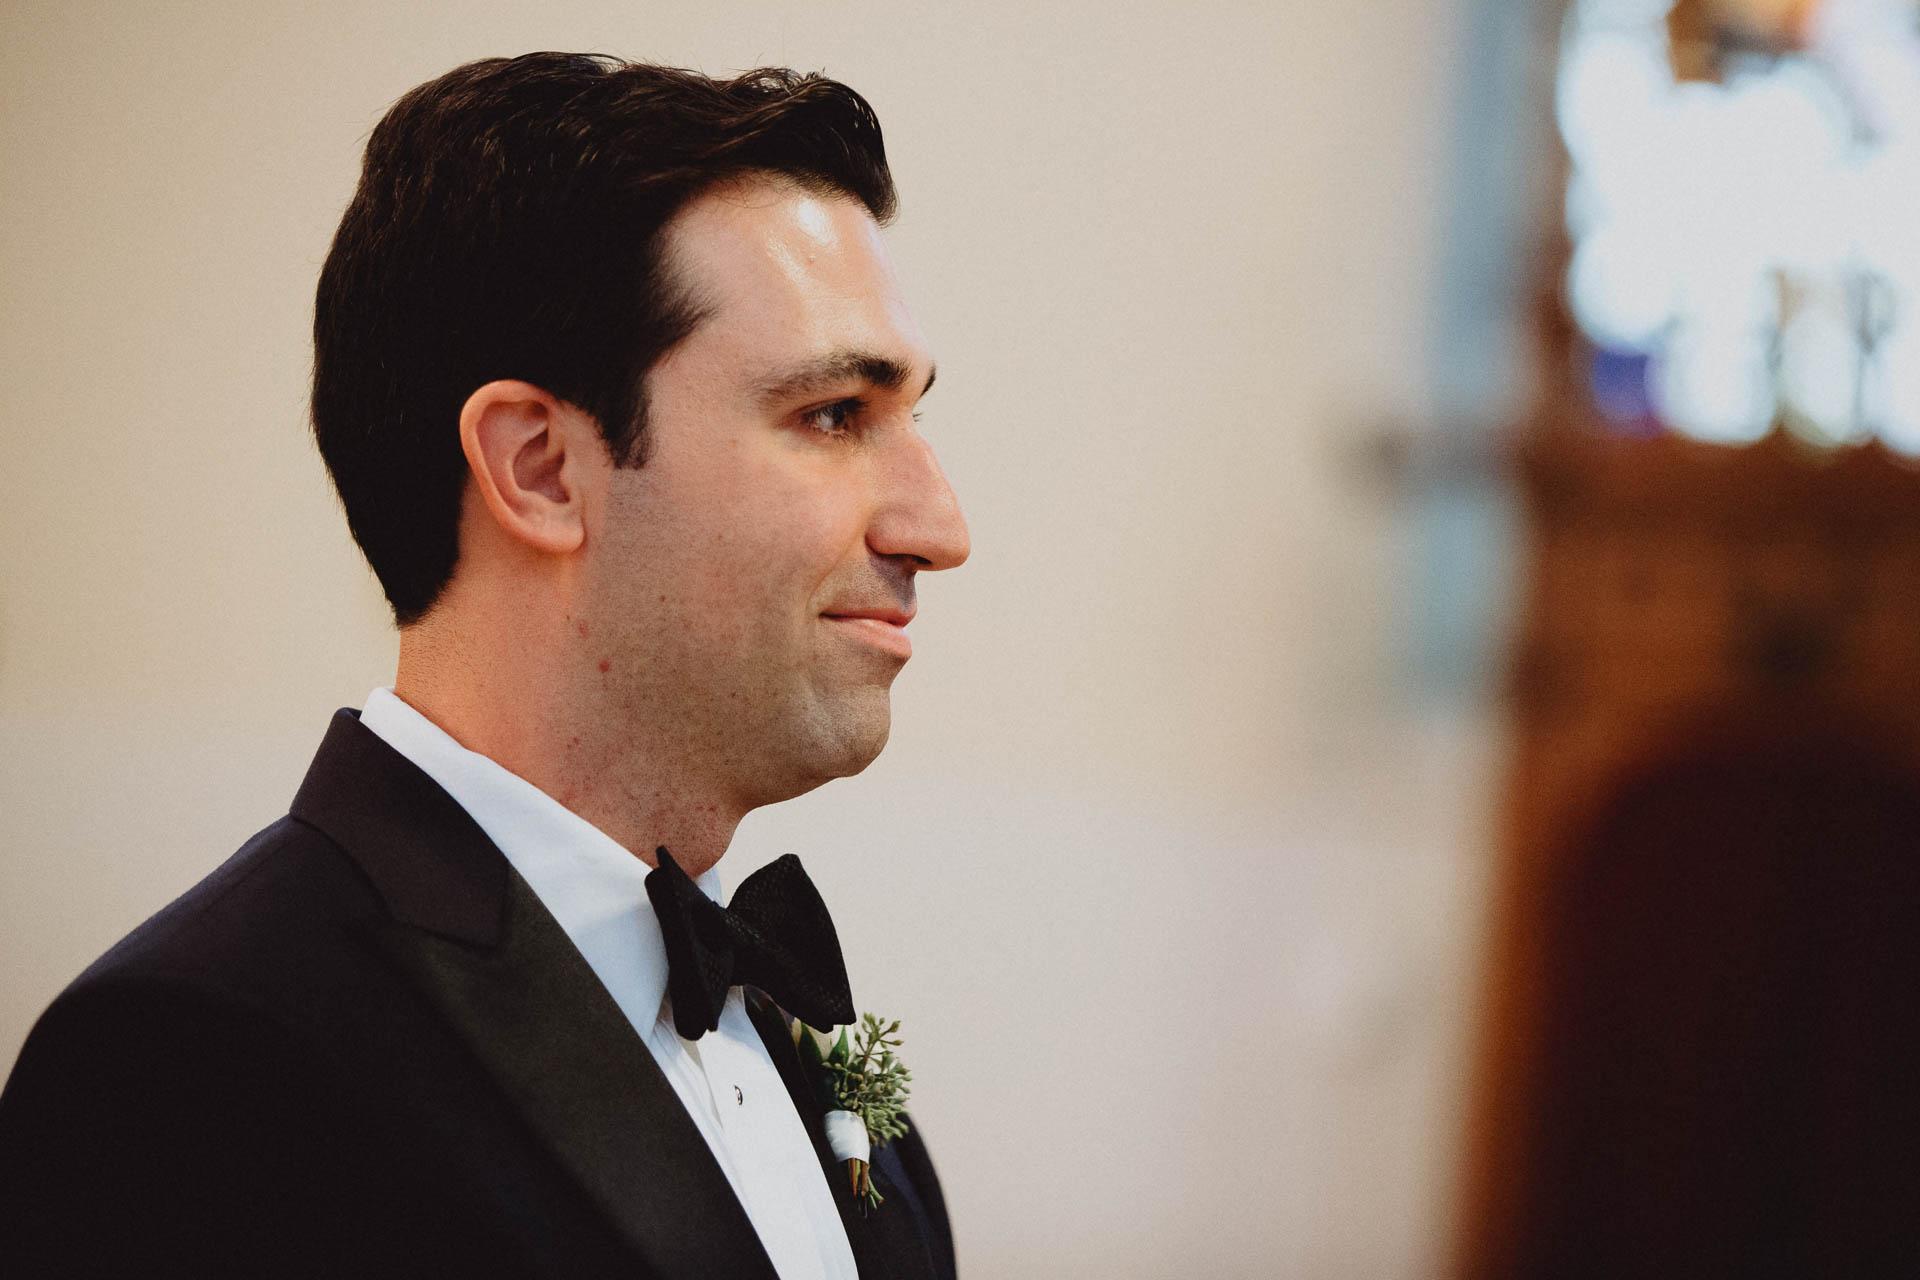 Keri-Joseph-Top-of-the-Market-Wedding-067@2x.jpg